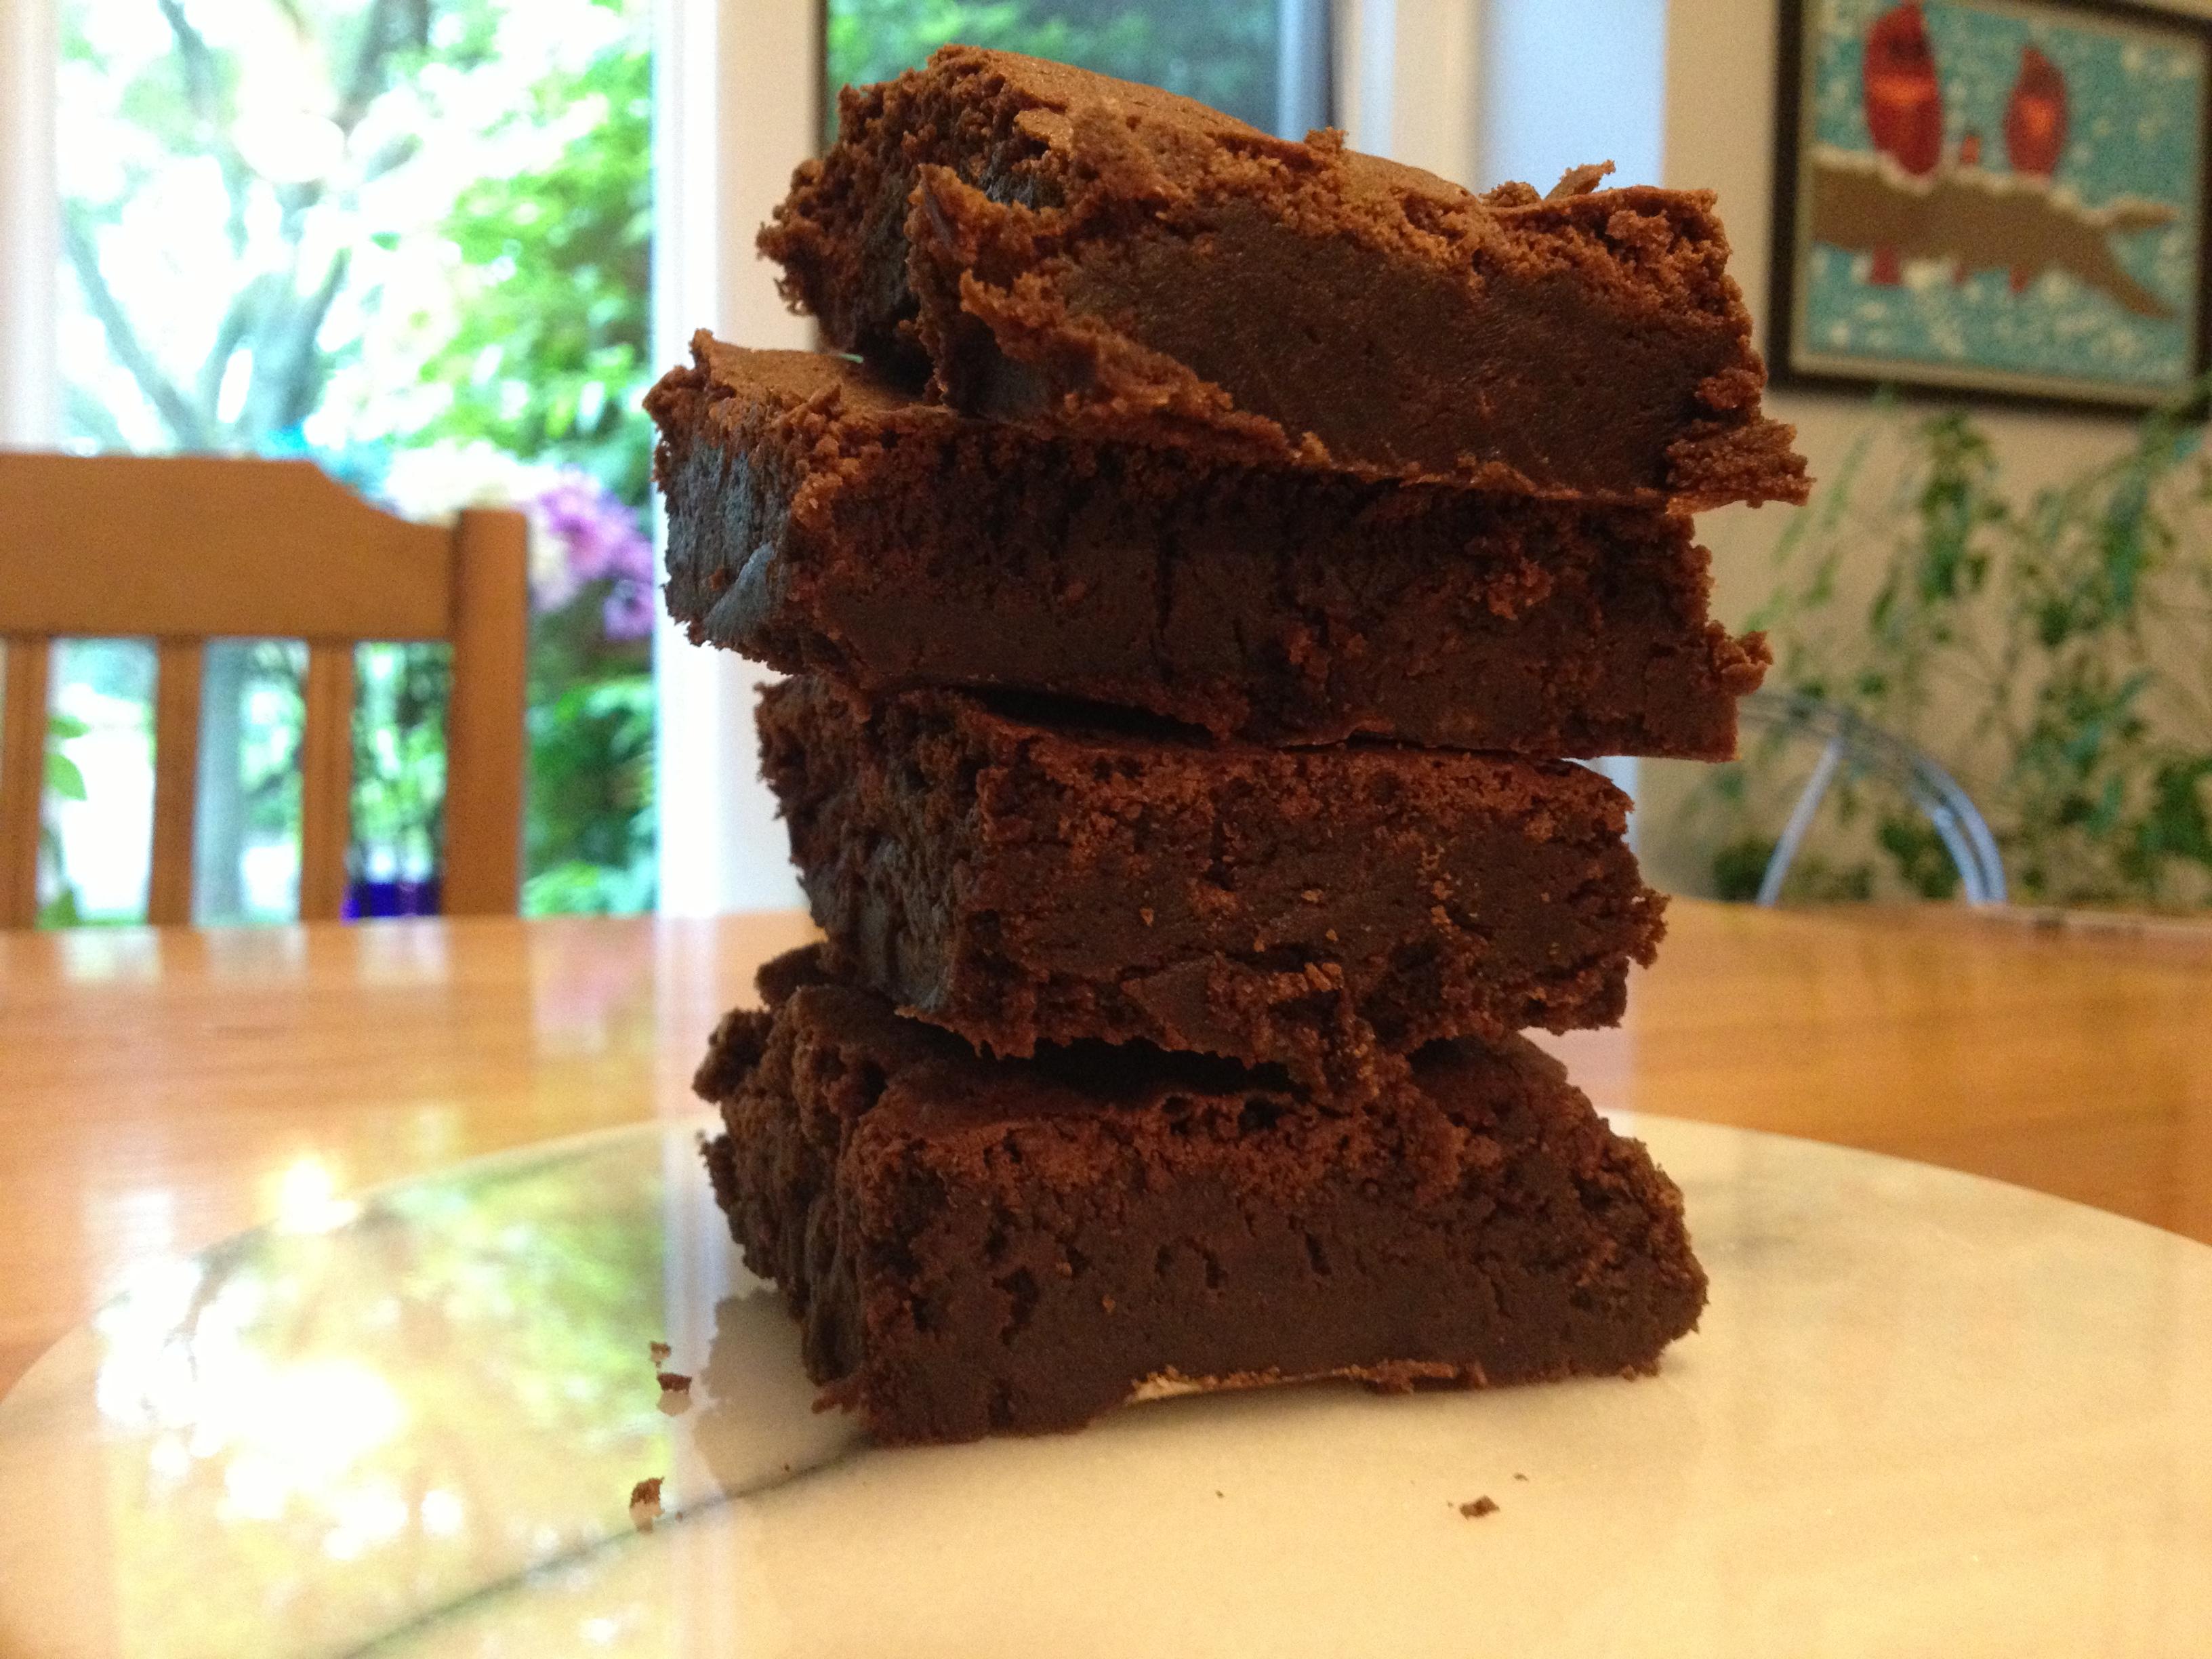 Blue apron brownies - Ruth Reichl S Artpark Brownies